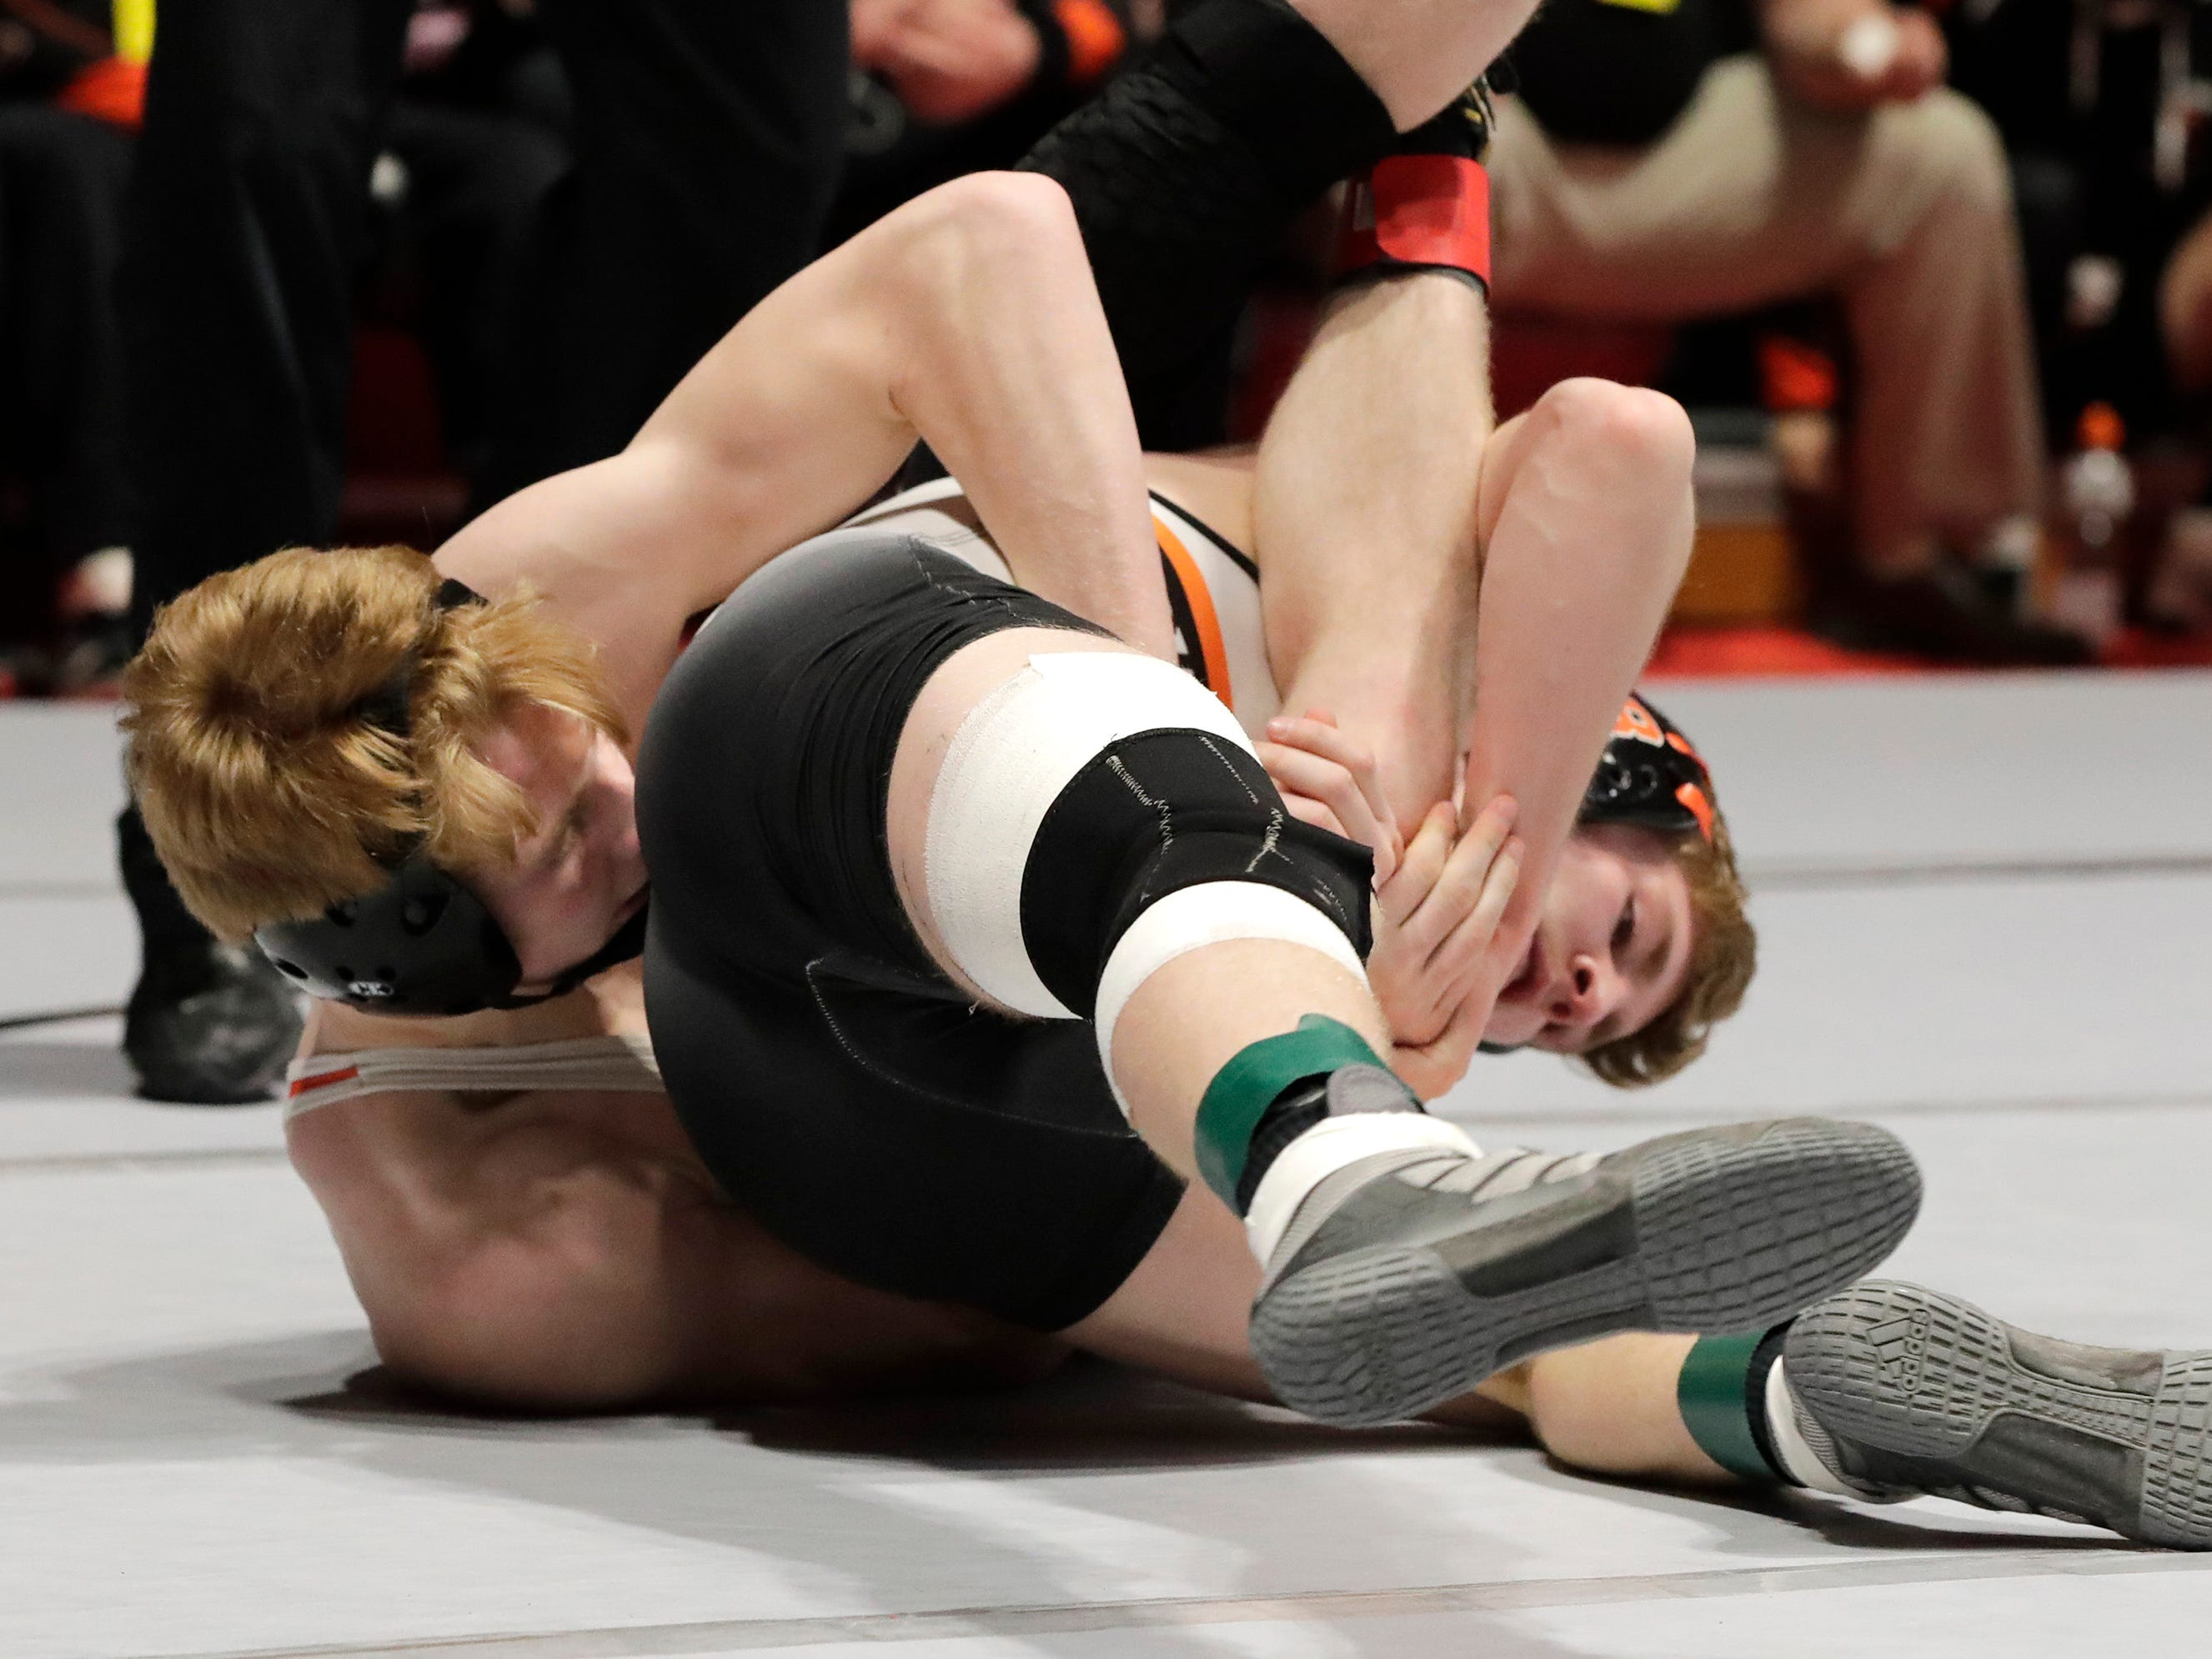 Burlington's Ryan Dolezal, right, wrestles Marshfield's Zach Weiler, left, in a 132-pound match, Friday, March 1, 2019, in Madison, Wis.